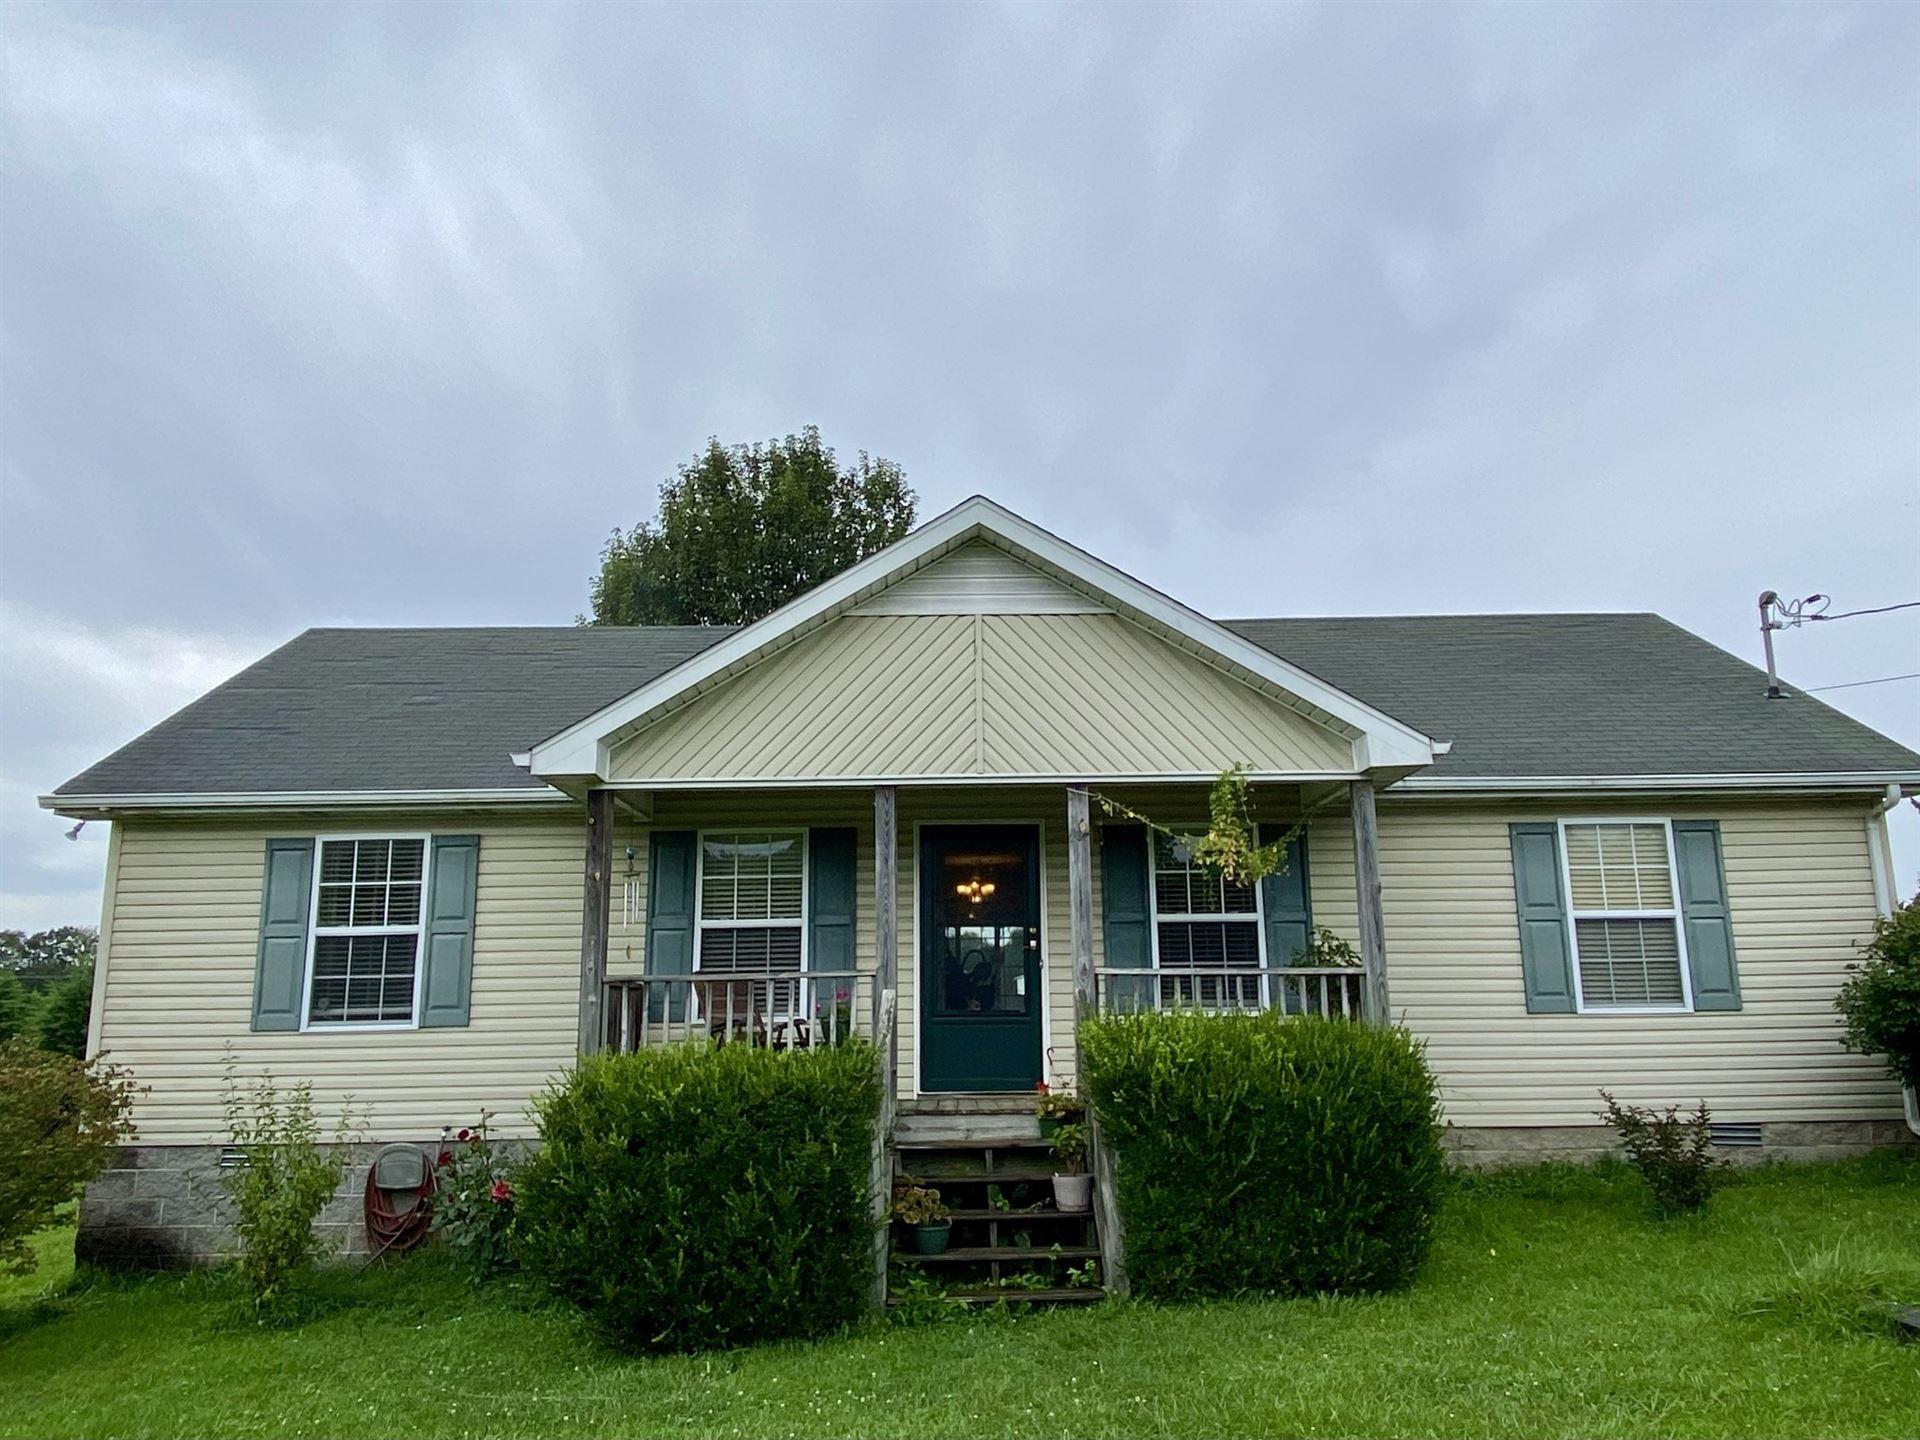 1130 Garners Creek Rd, Dickson, TN 37055 - MLS#: 2294261